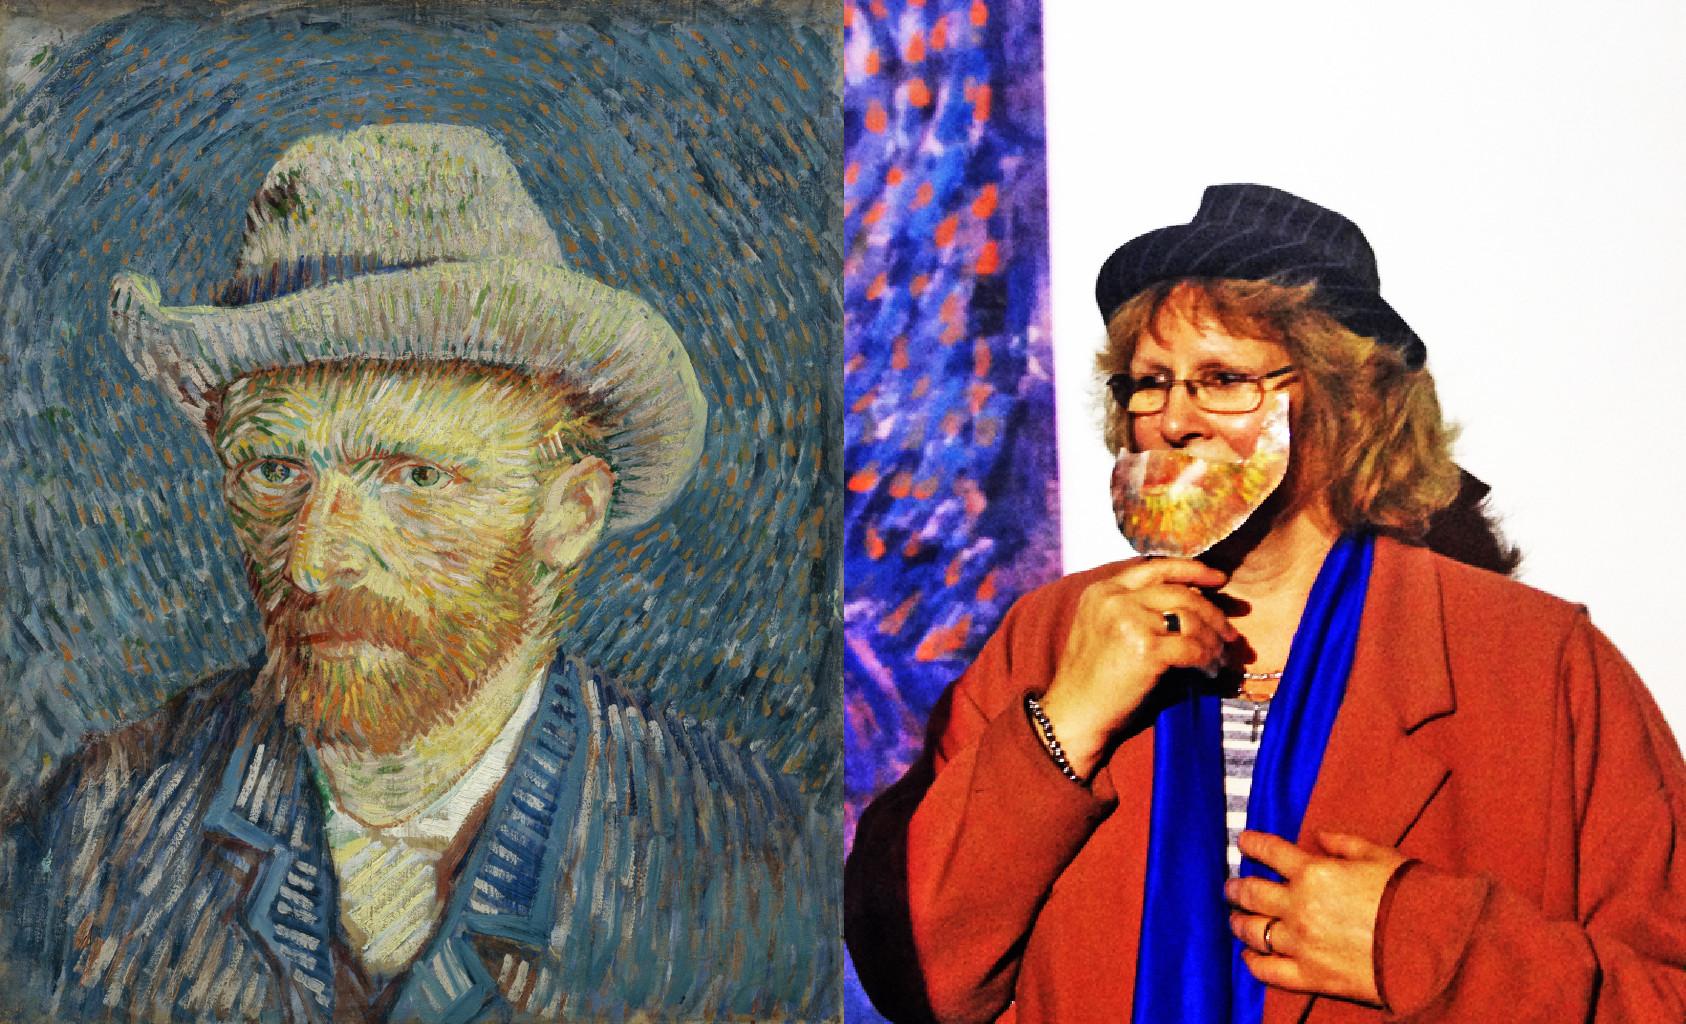 Self-Portrait with Grey Felt Hat, Vincent van Gogh (1853-1890) vanGo'd by Veronica